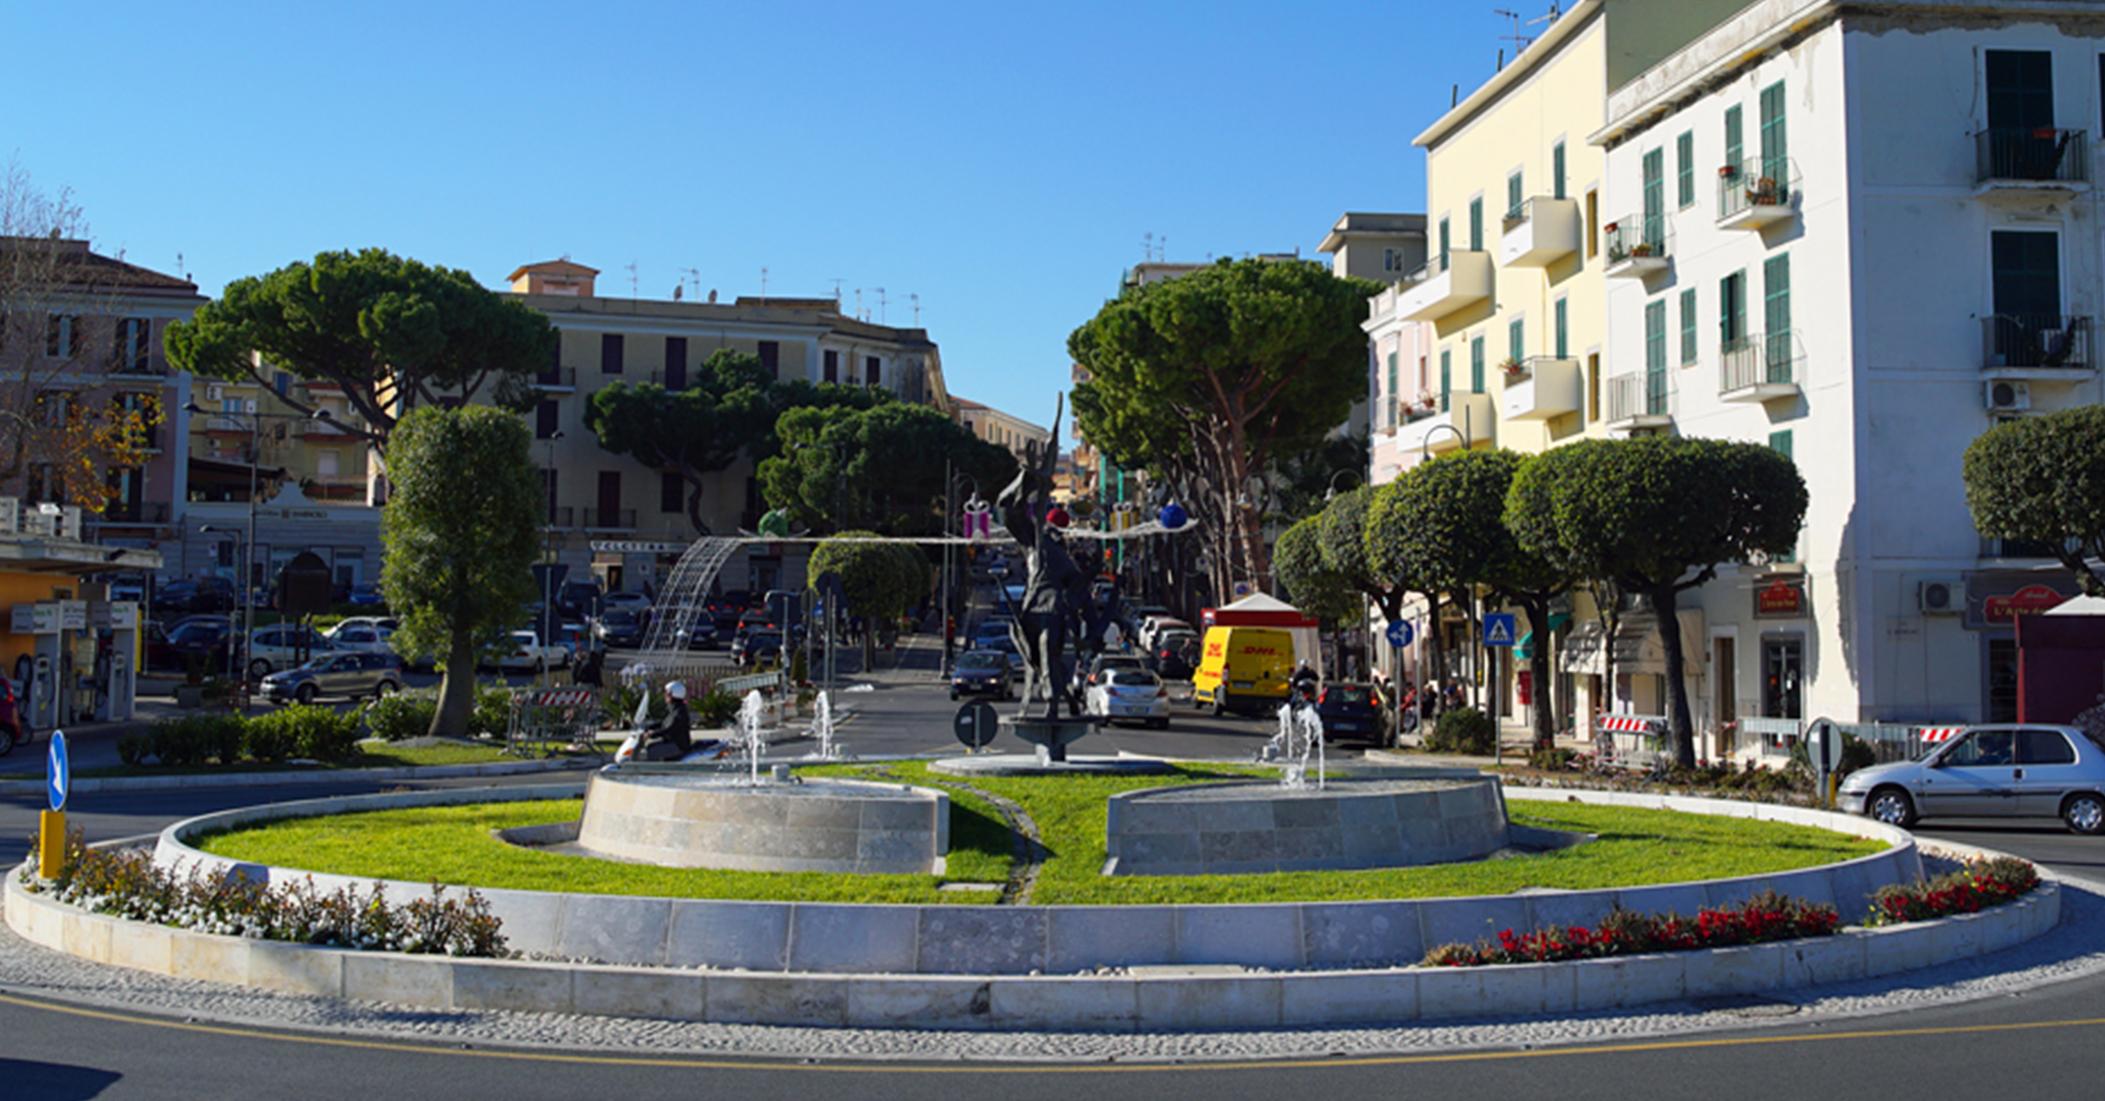 6_fontana_monumentale_gaeta_architetto_davide_di_cola_ldcarchitettura_891x466